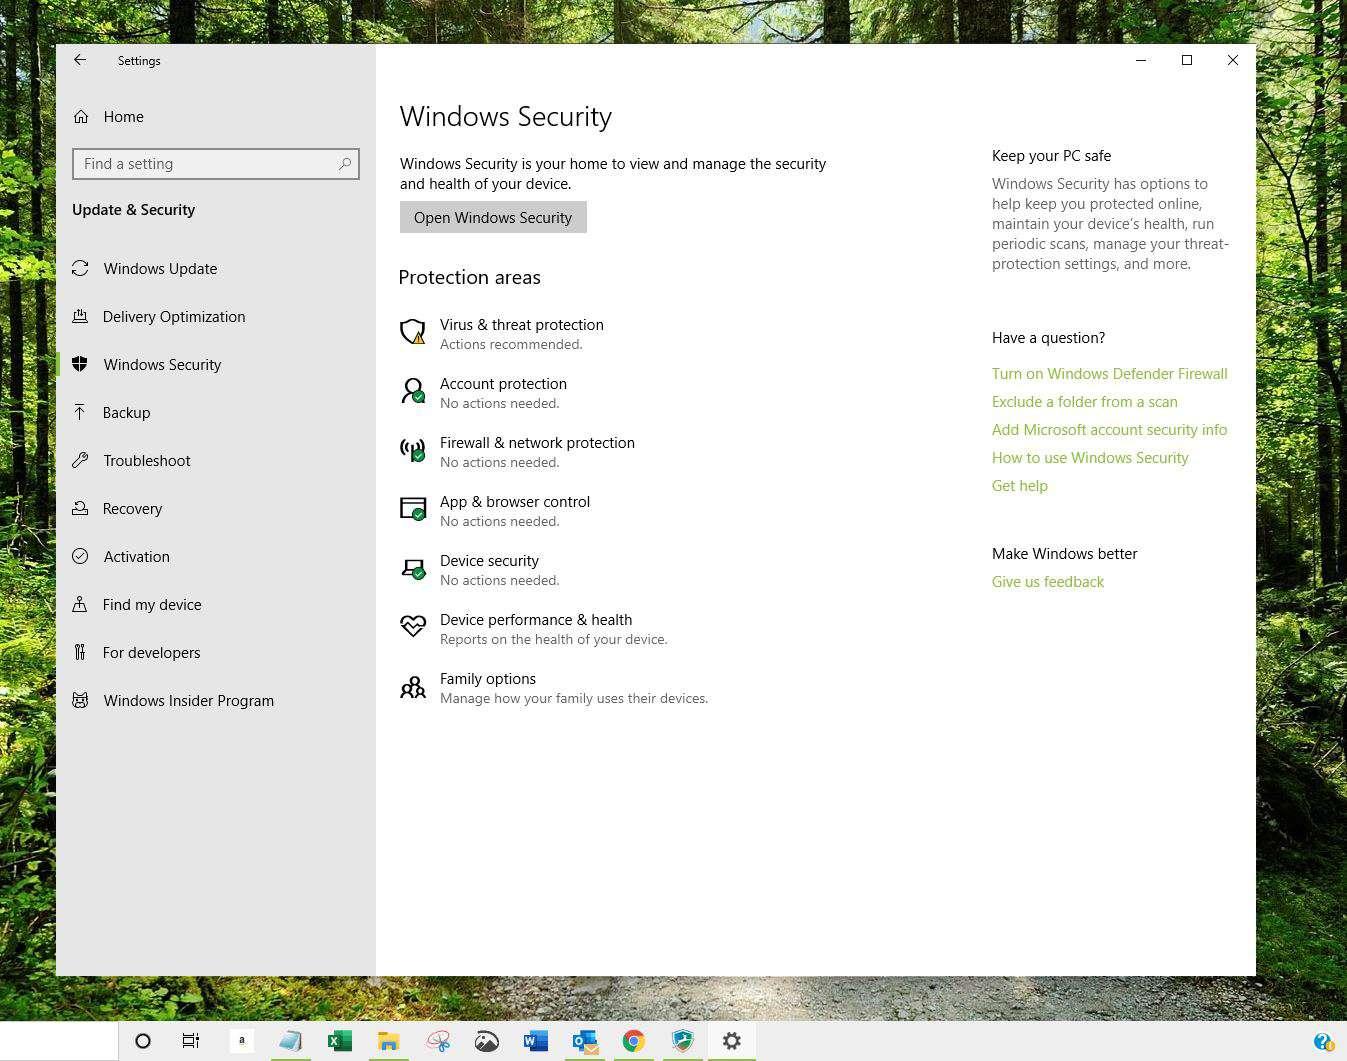 Windows Security in Windows 10